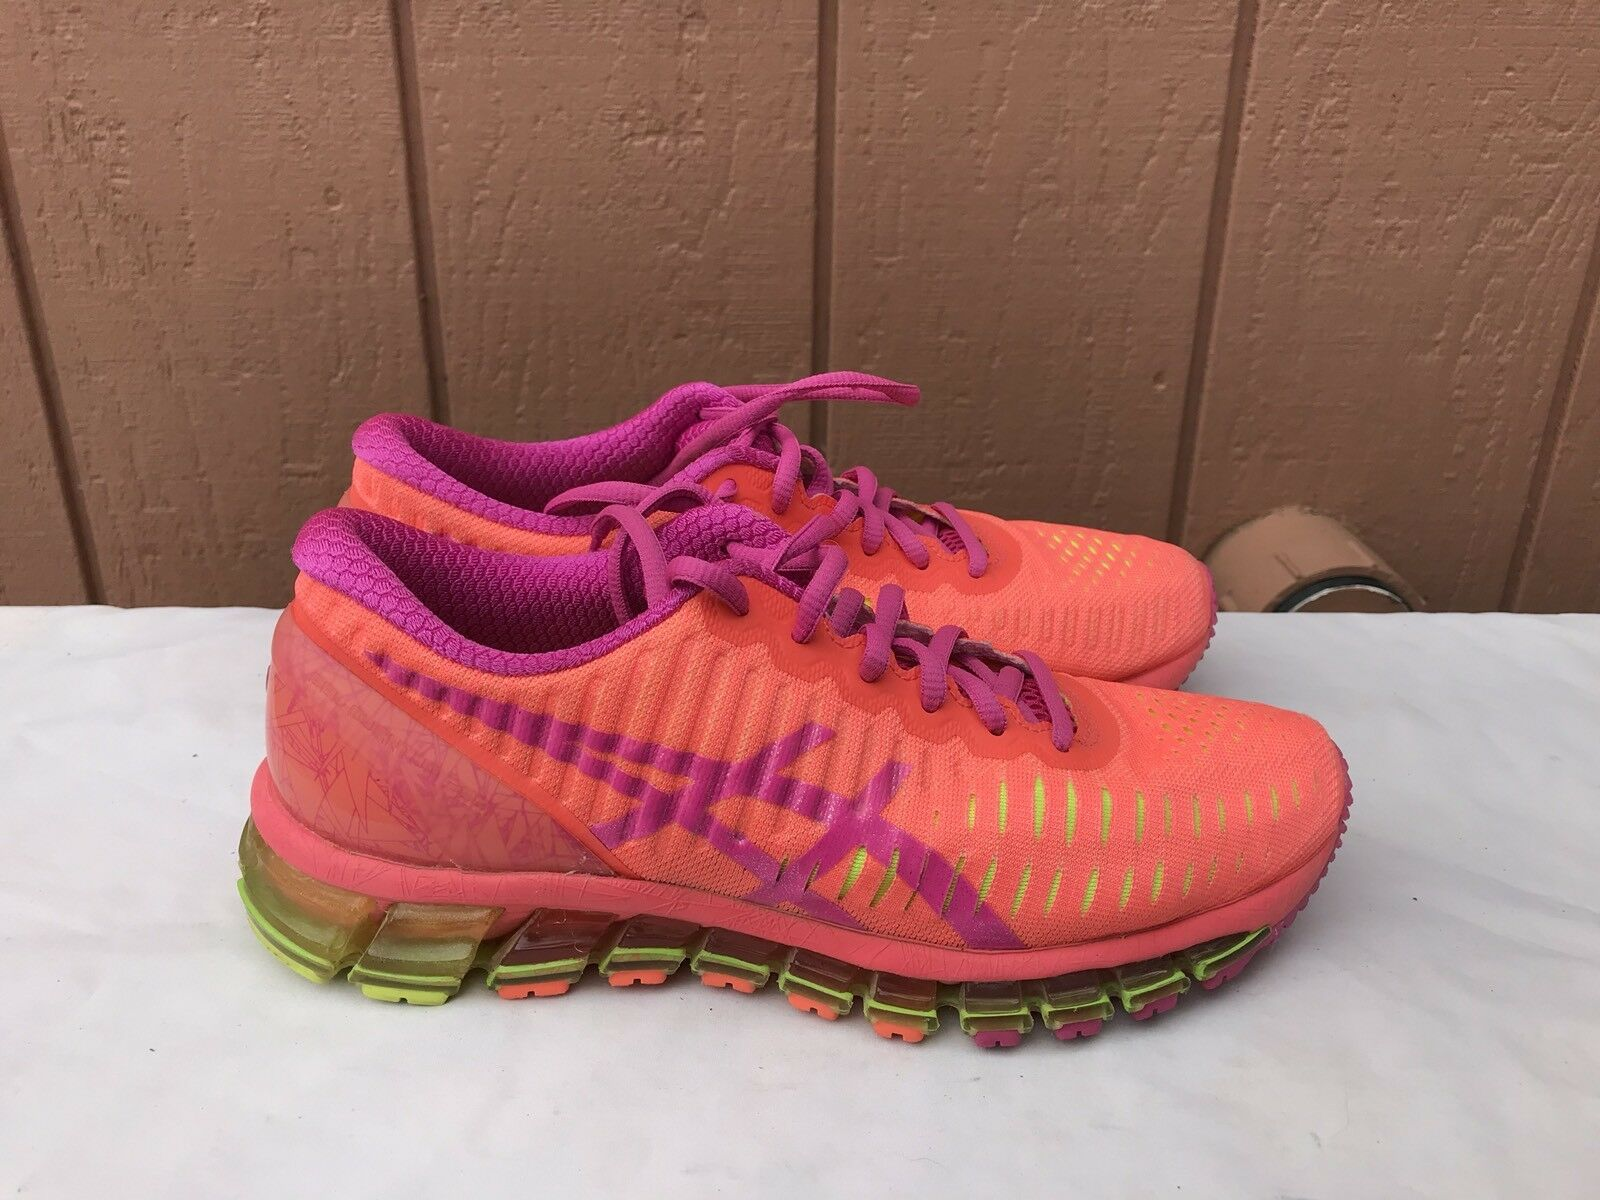 MINT Womens Asics Gel Quantum 360 US 7 Running Shoes Tennis T5J6N Pink Orange Cheap women's shoes women's shoes